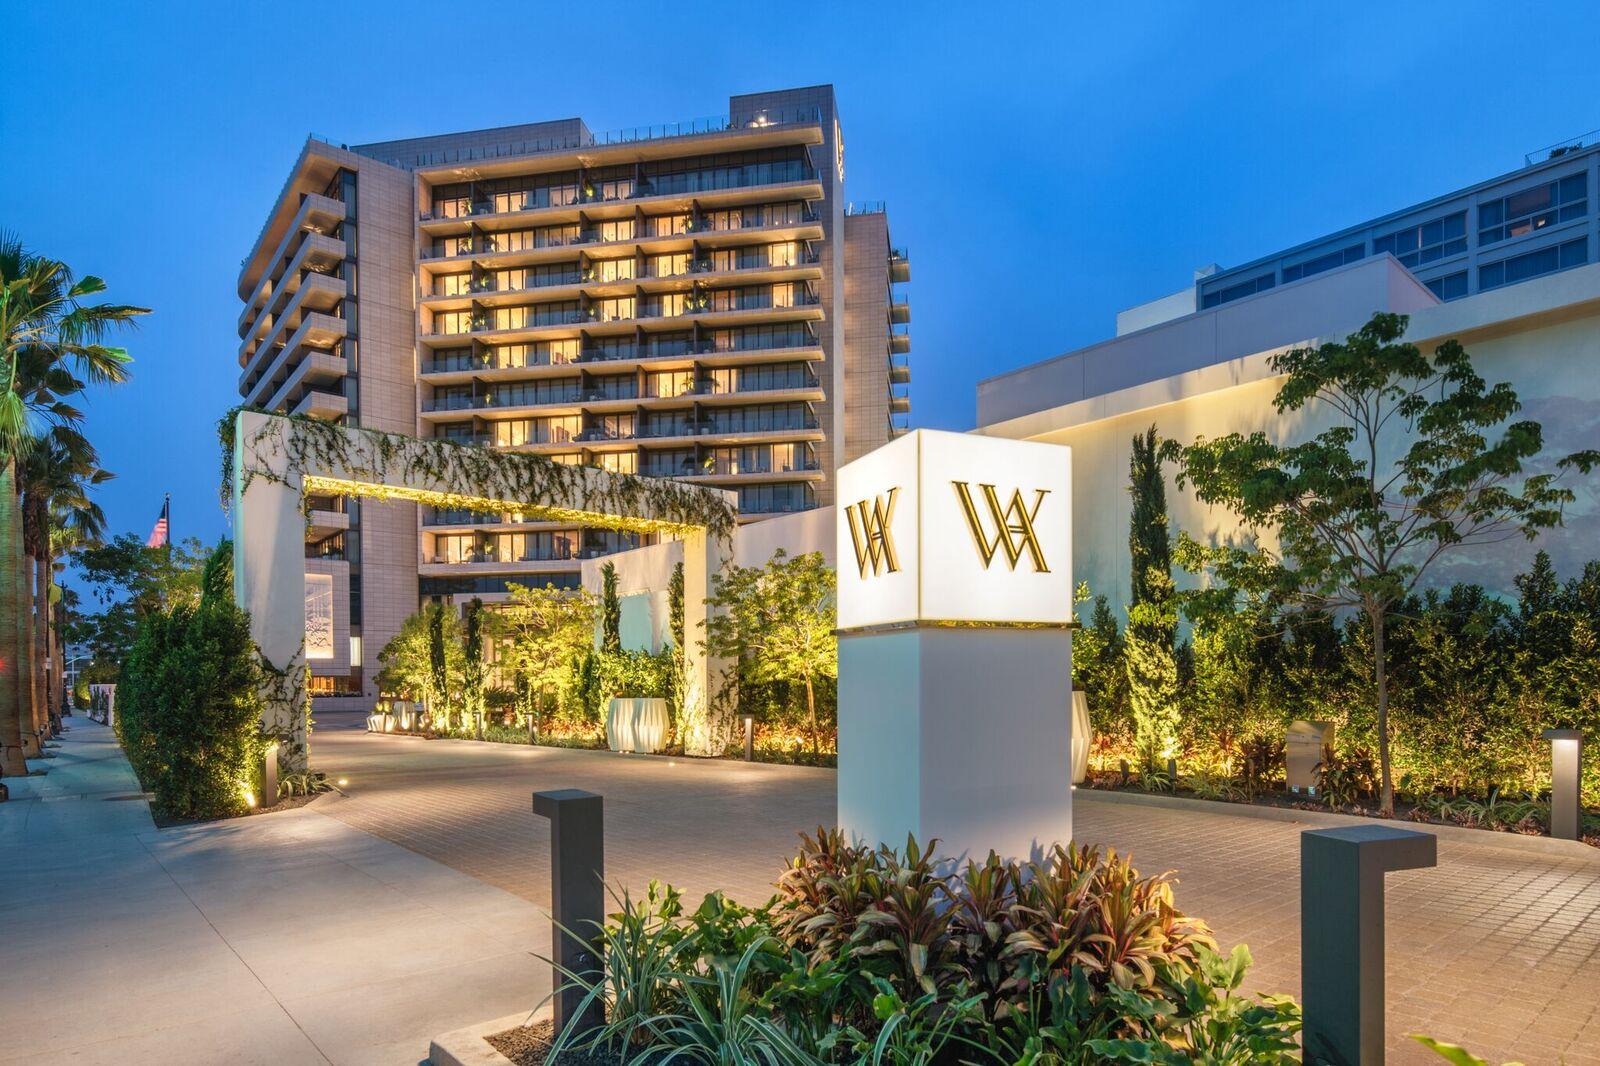 New luxury hotel waldorf astoria beverly hills for Waldorf home